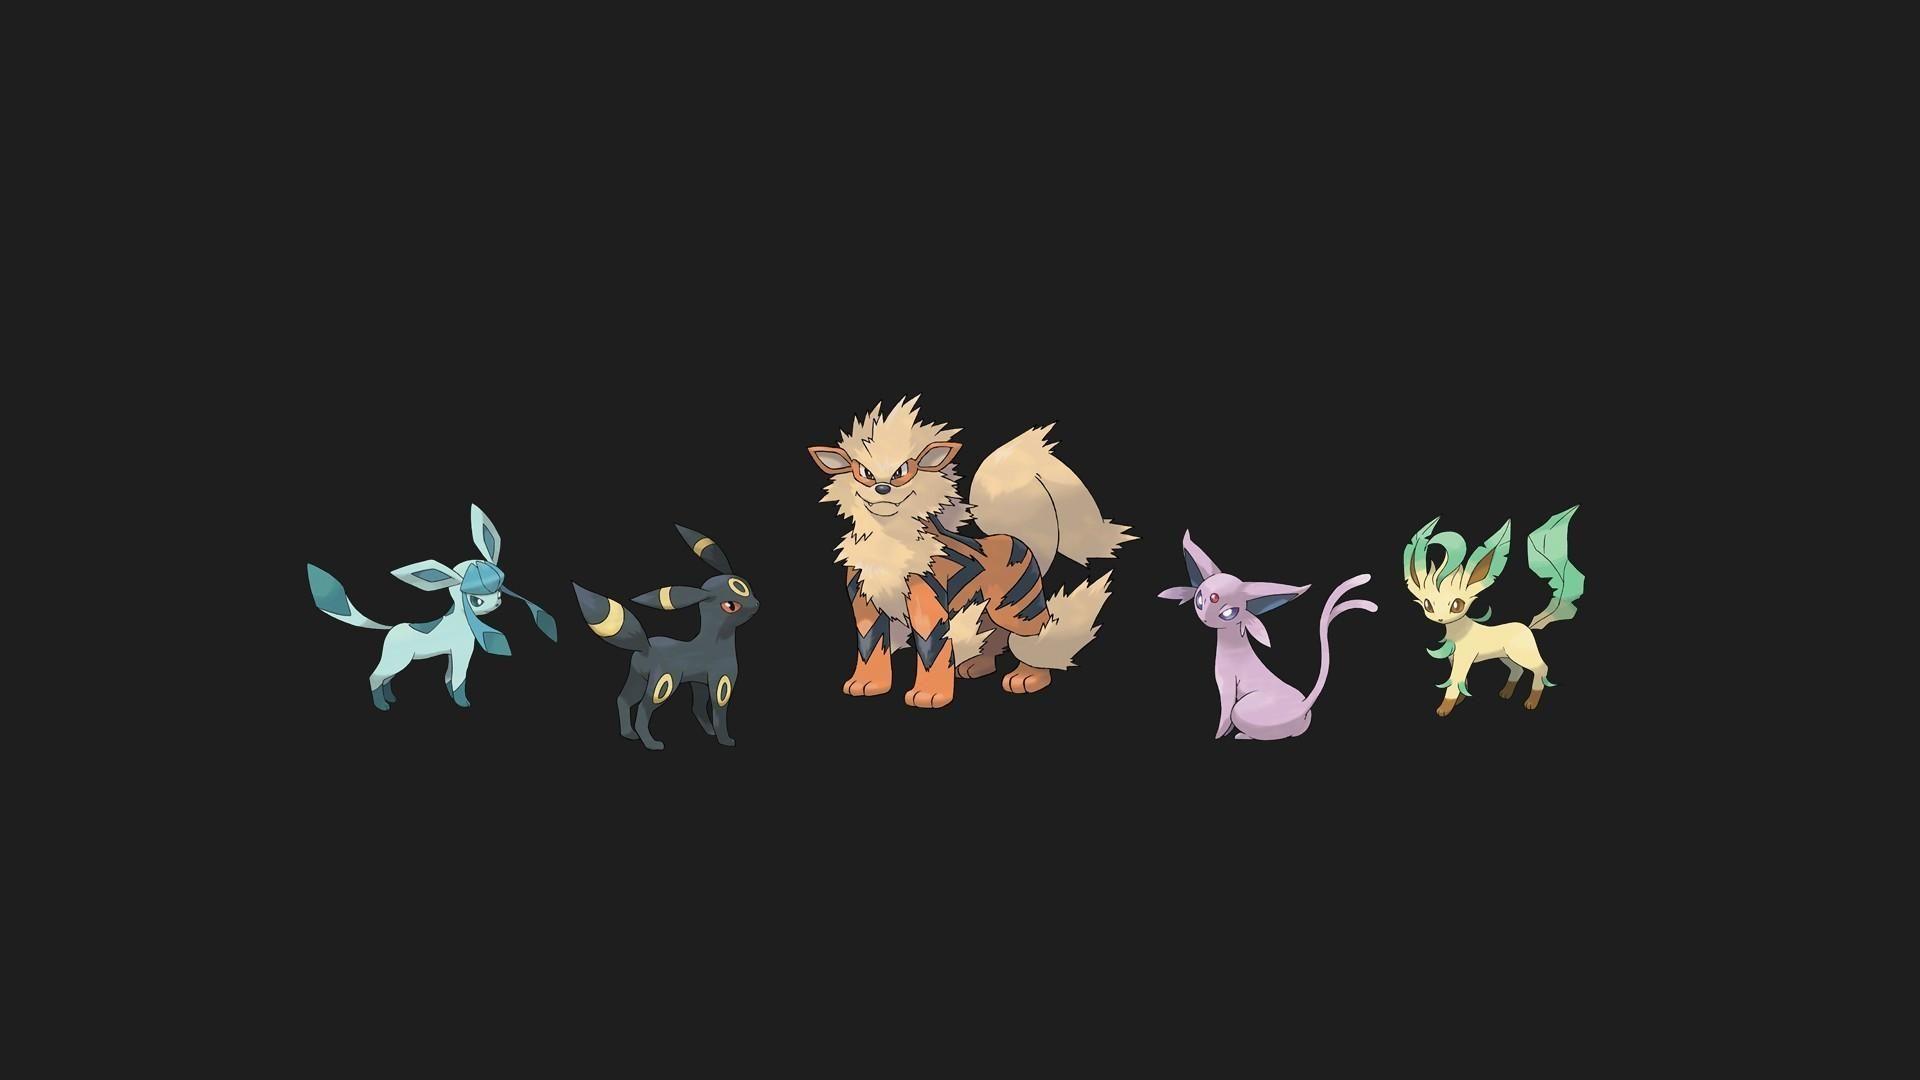 Pokemon Espeon Wallpaper